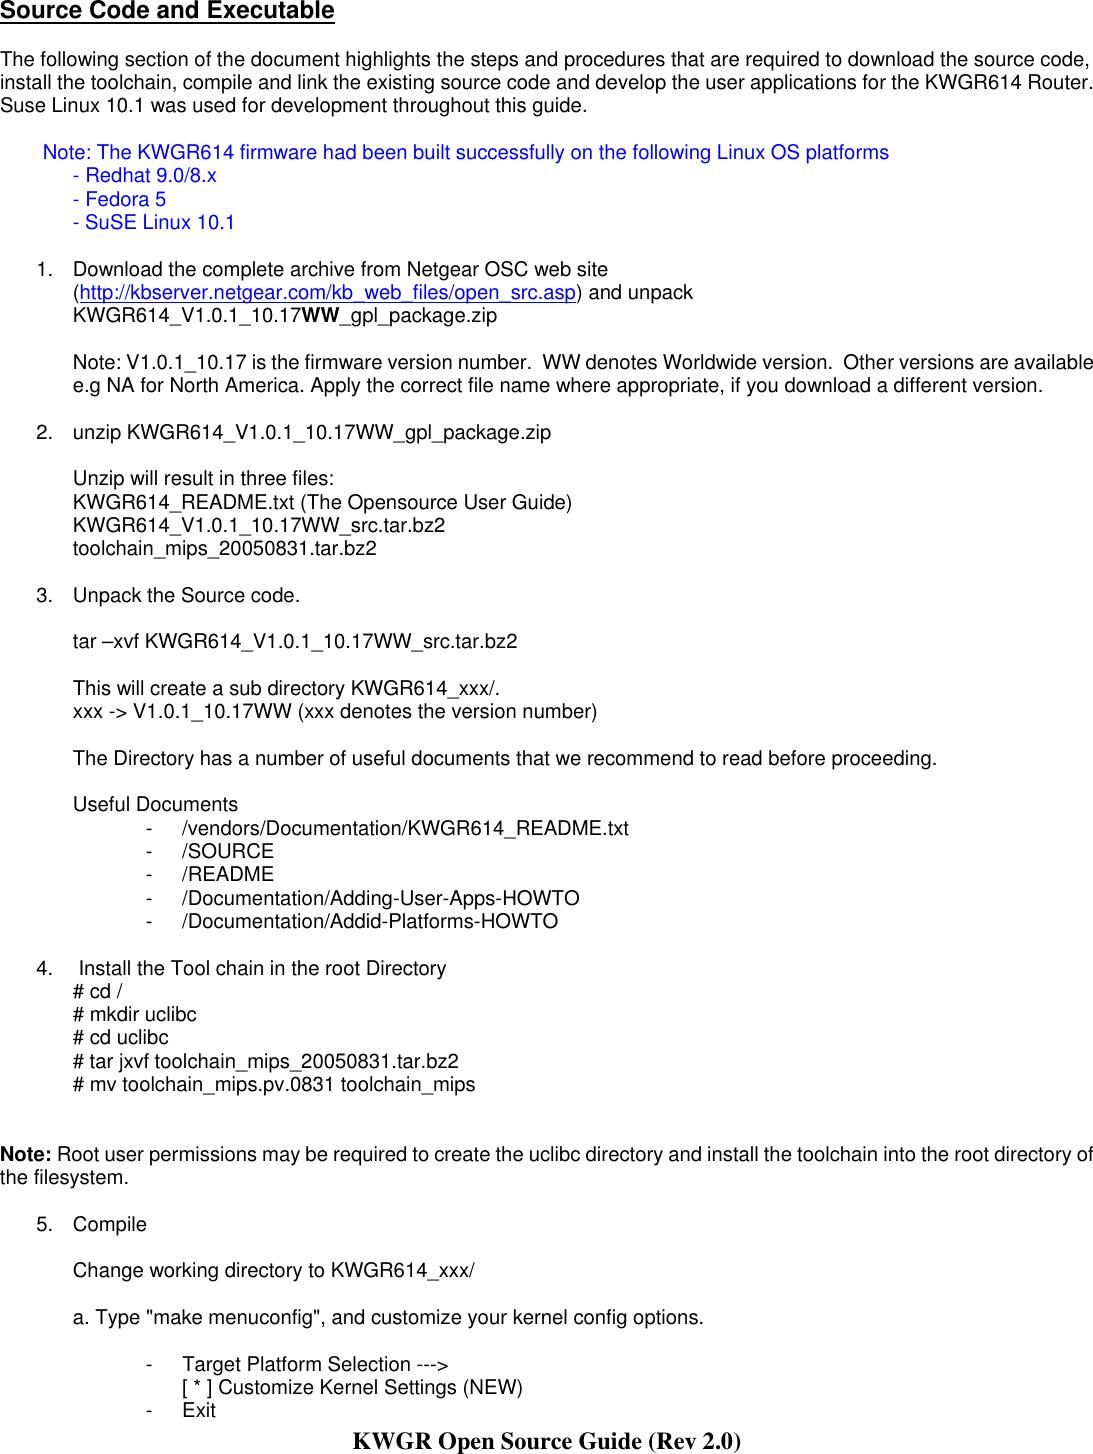 Netgear Kwgr614 Owner S Manual Opensource Guide Rev2 0